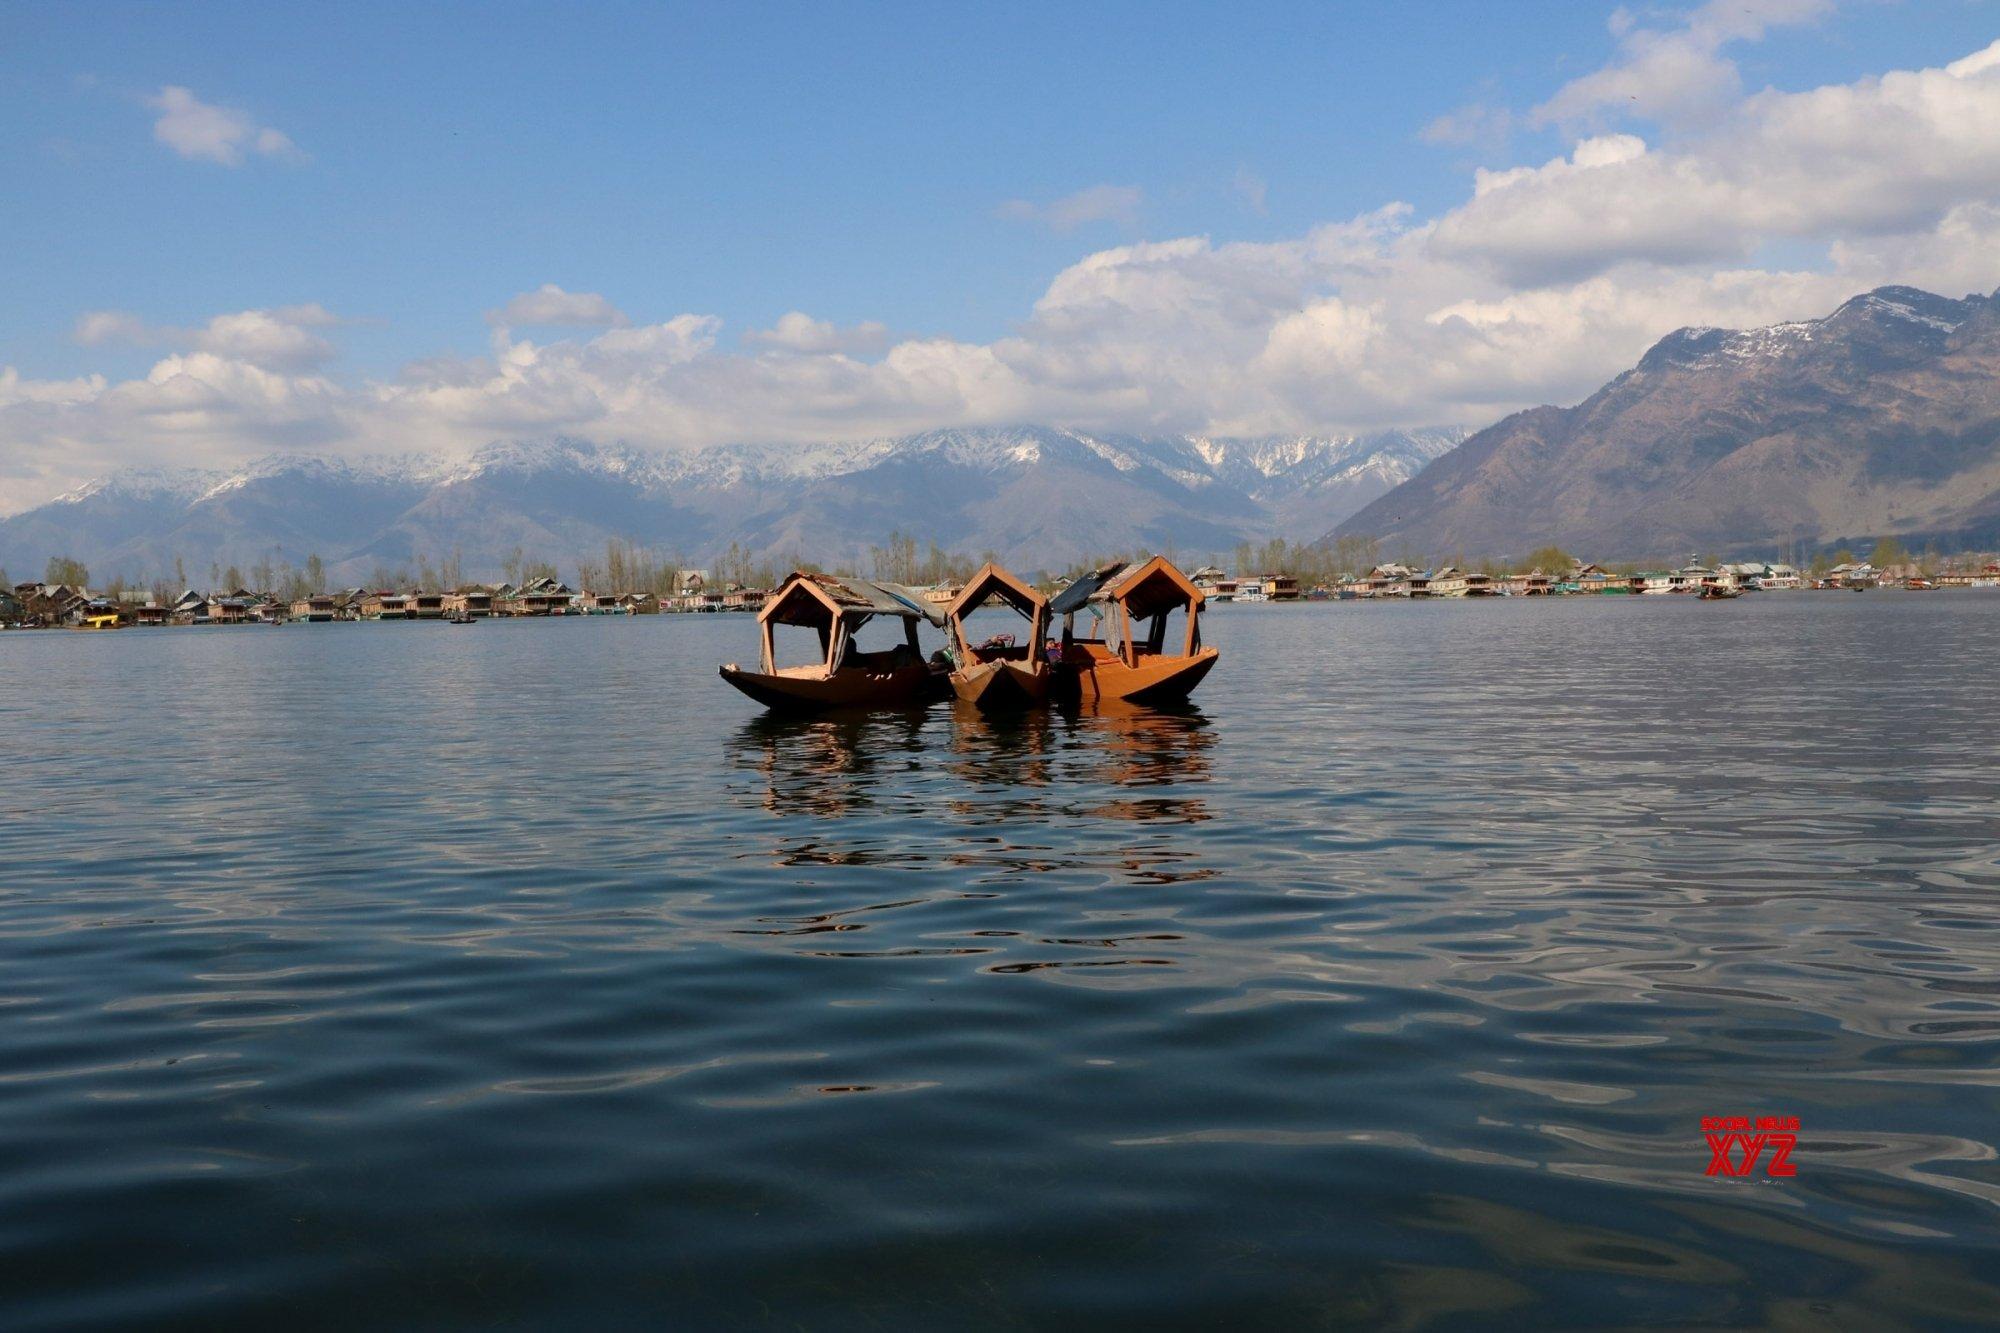 Dal Lake to be beautified under Smart City plan